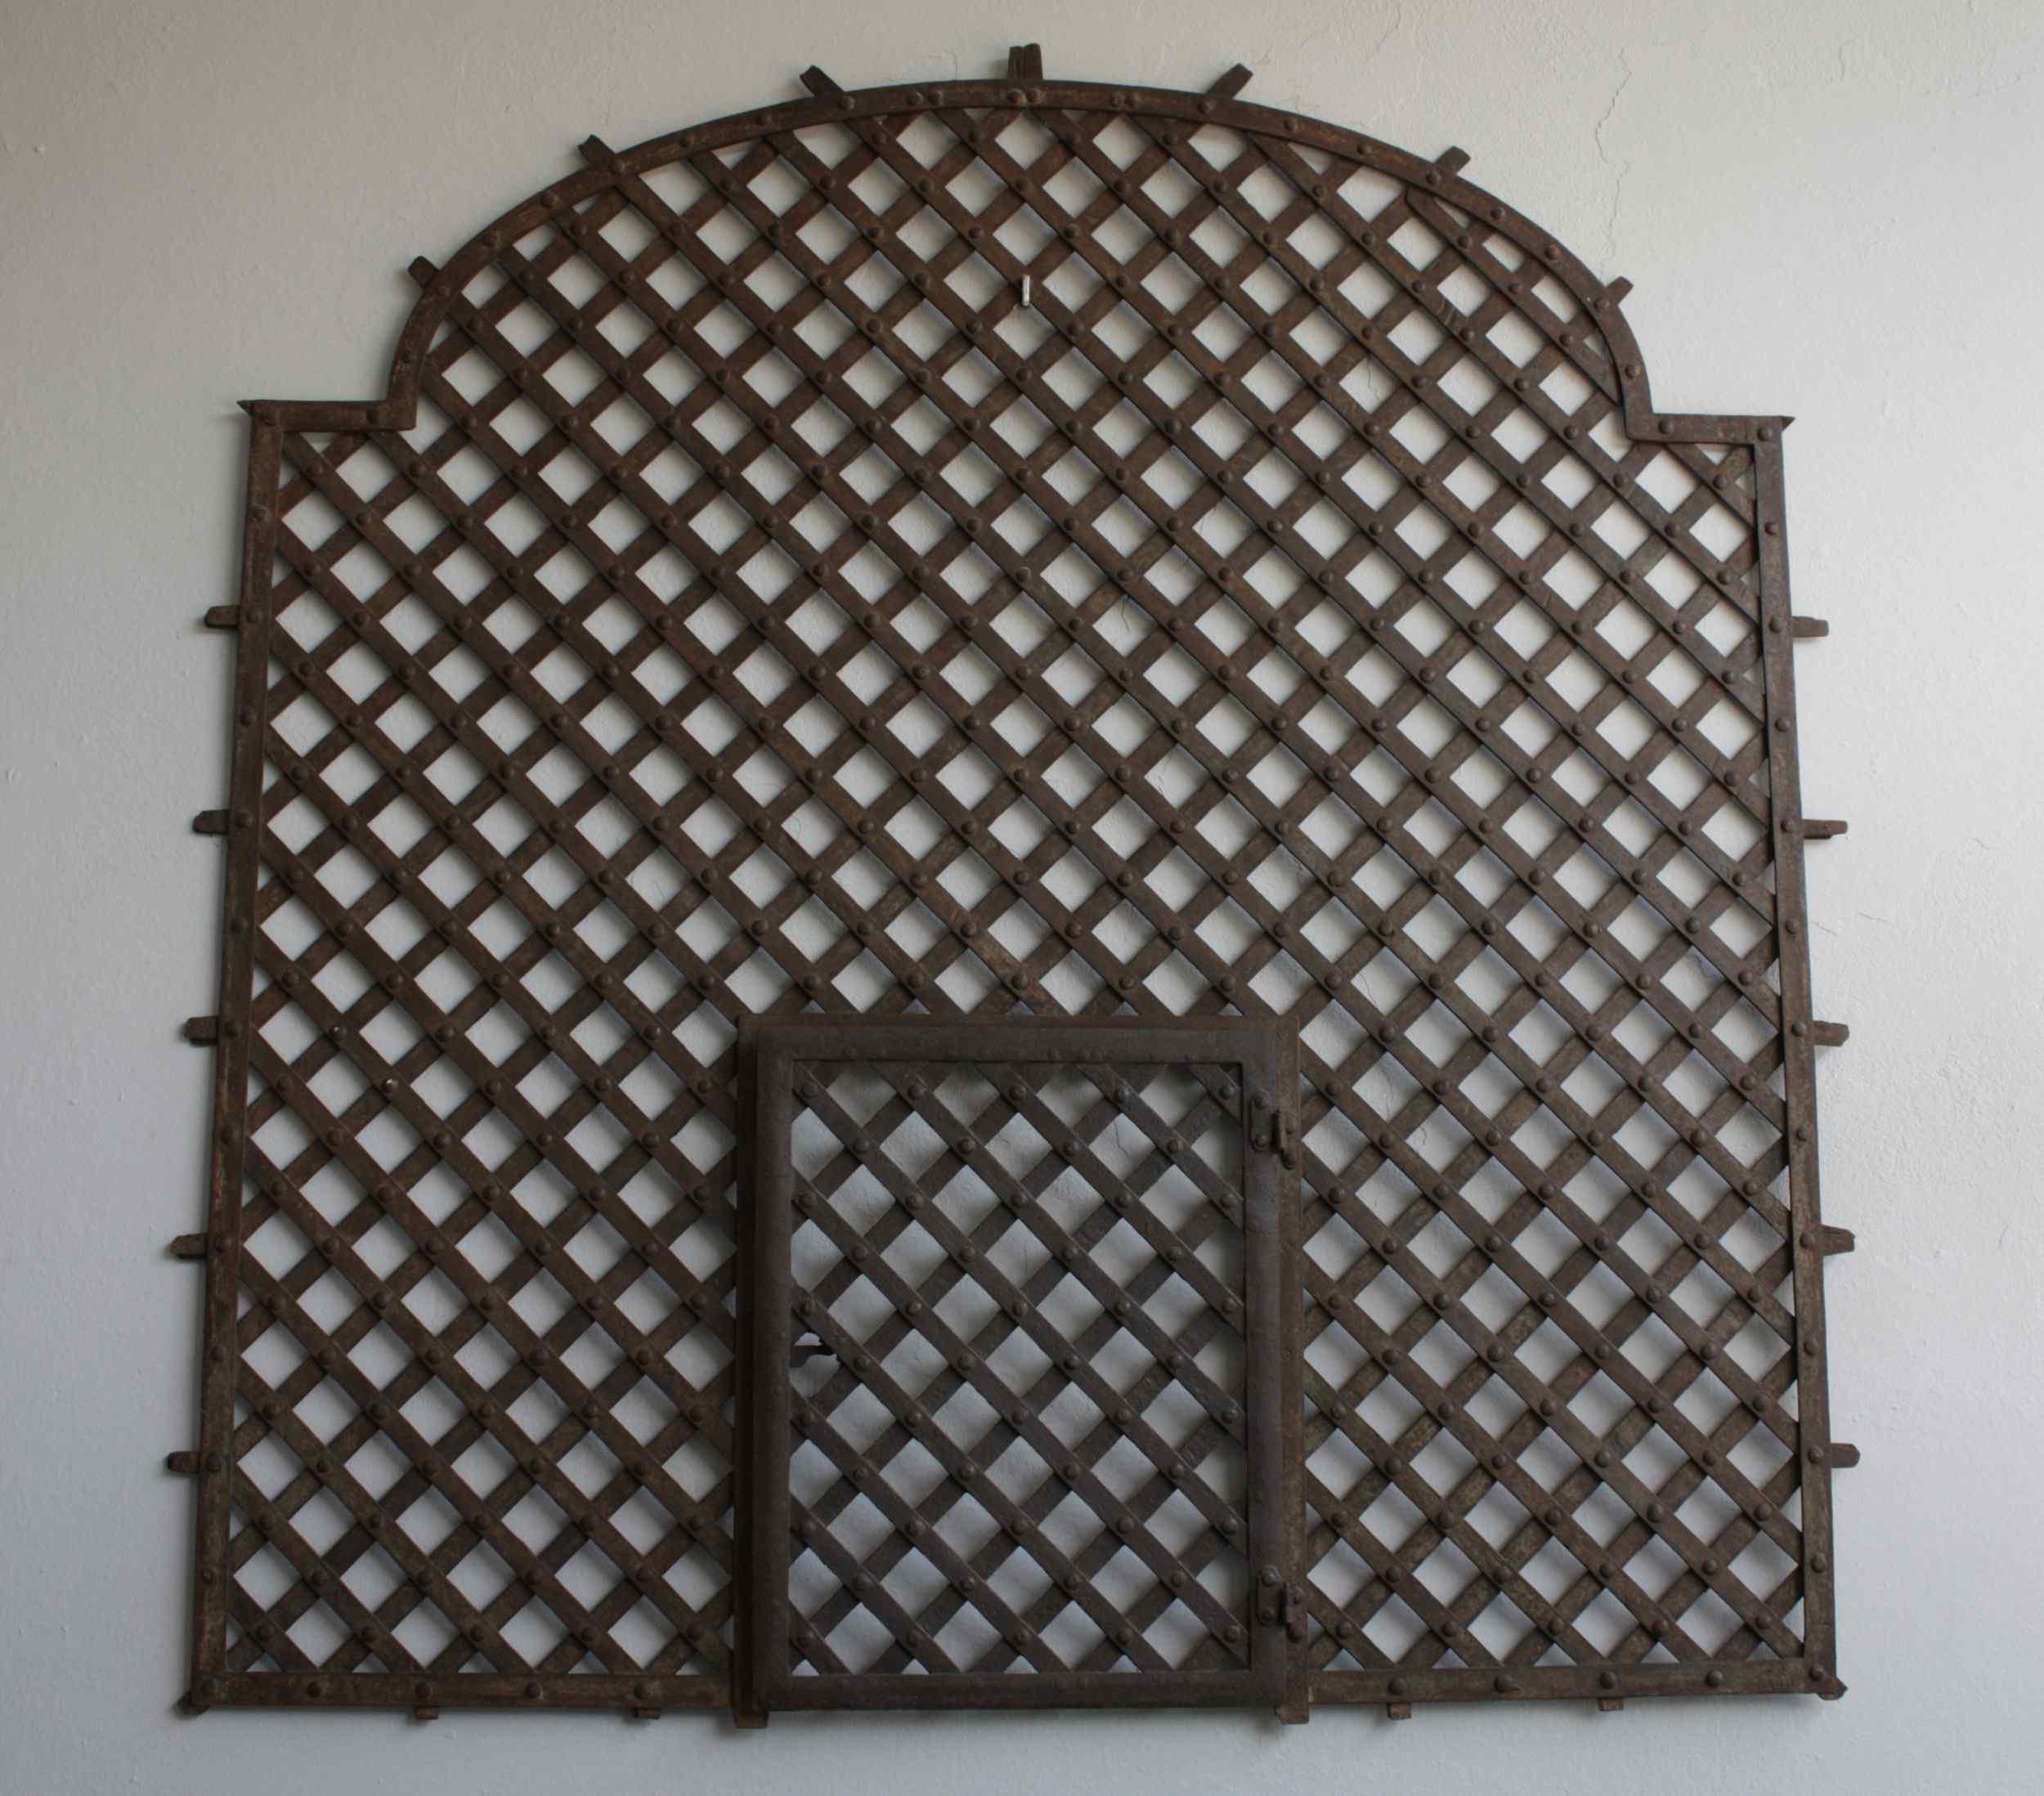 Grate Iron seventeenth century